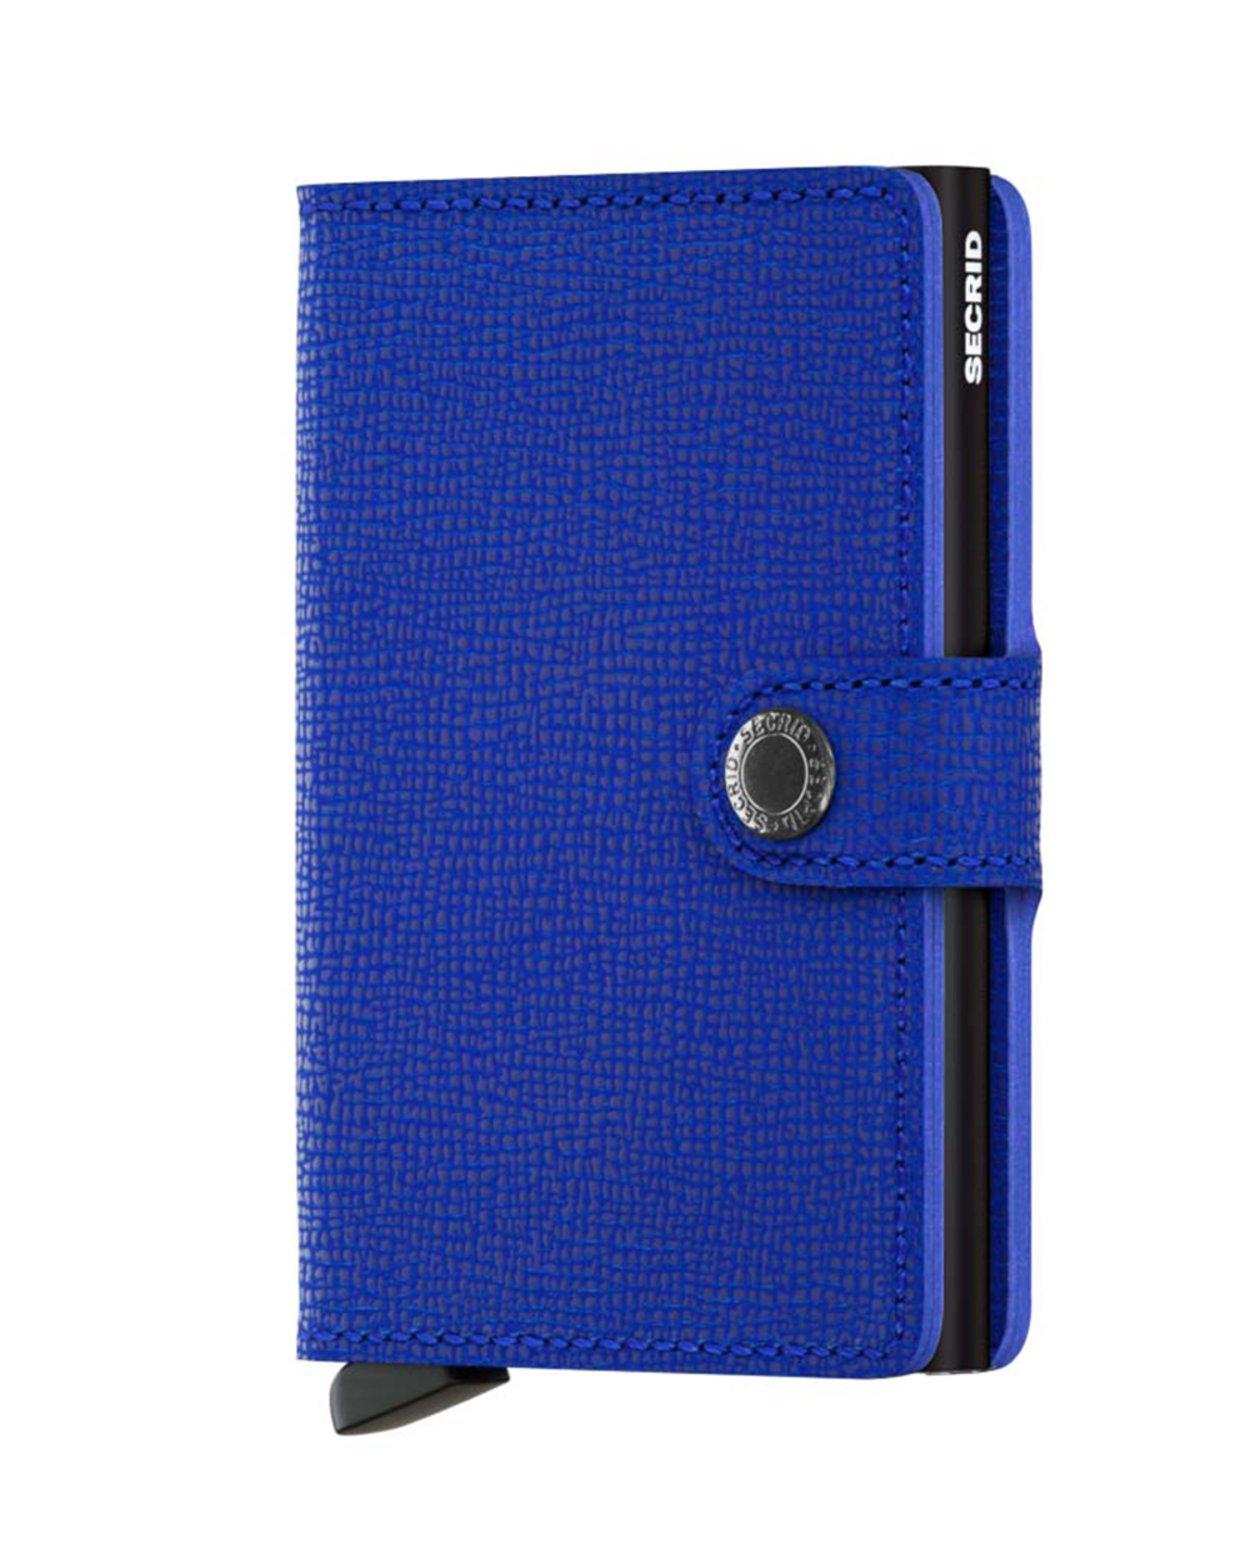 Crisple Leather Mini Wallet - Blue & Black